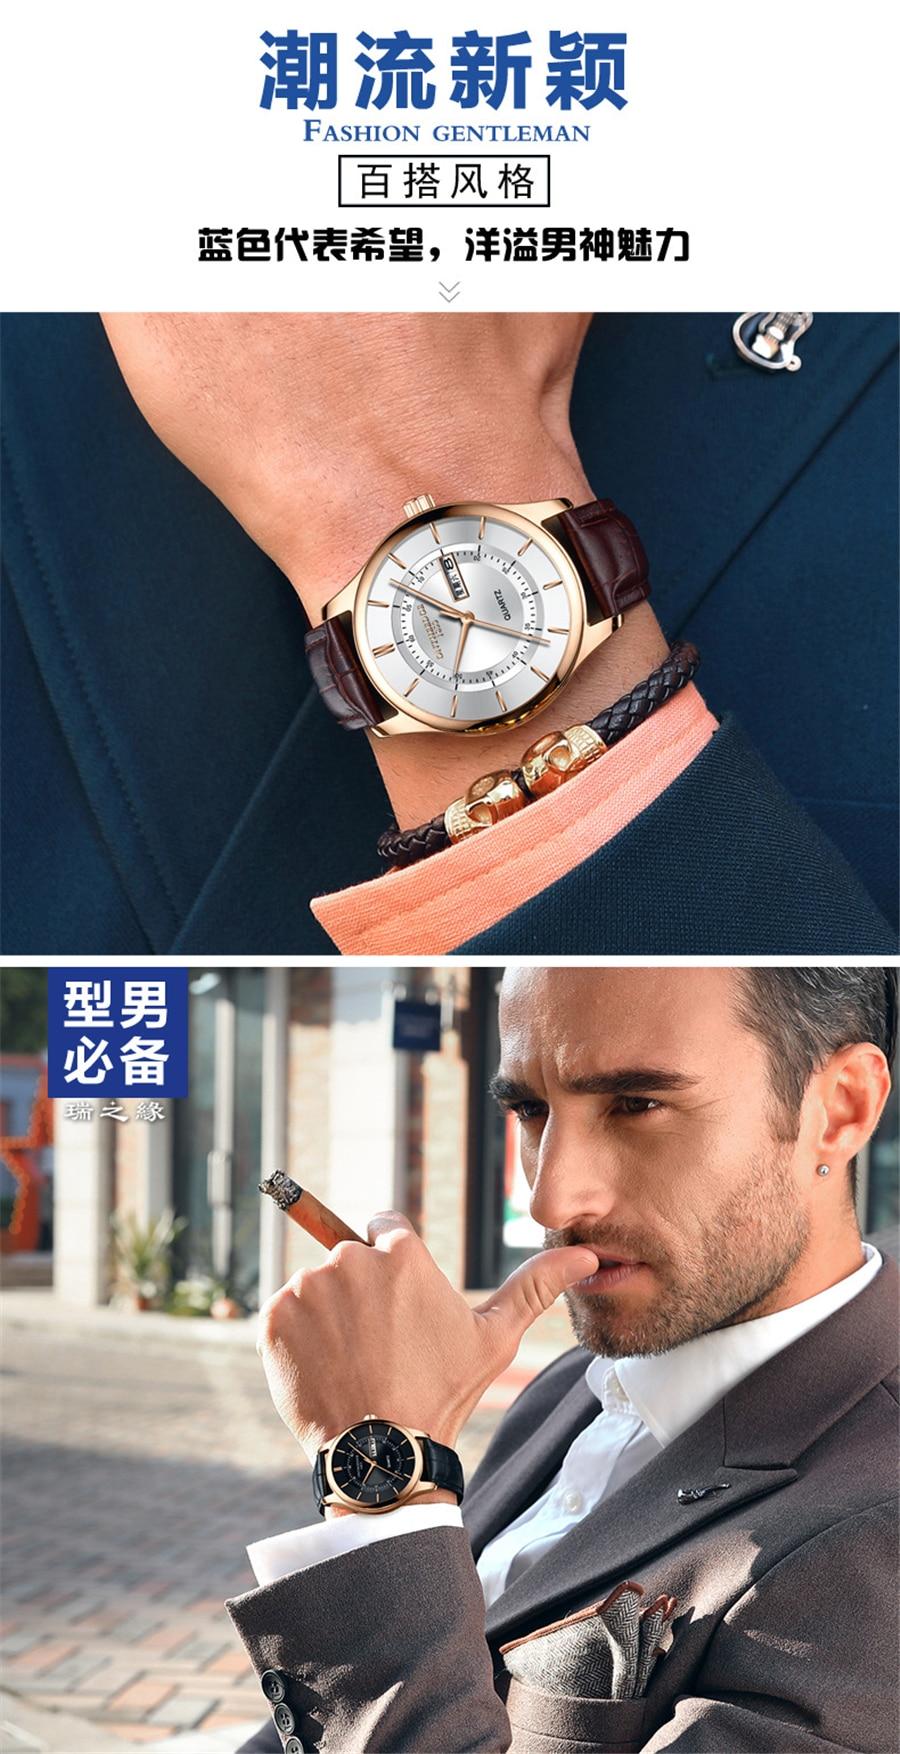 HTB1EFs1iHGYBuNjy0Foq6AiBFXaK High Quality Rose Gold Dial Watch Men Leather Waterproof 30M Watches Business Fashion Japan Quartz Movement Auto Date Male Clock